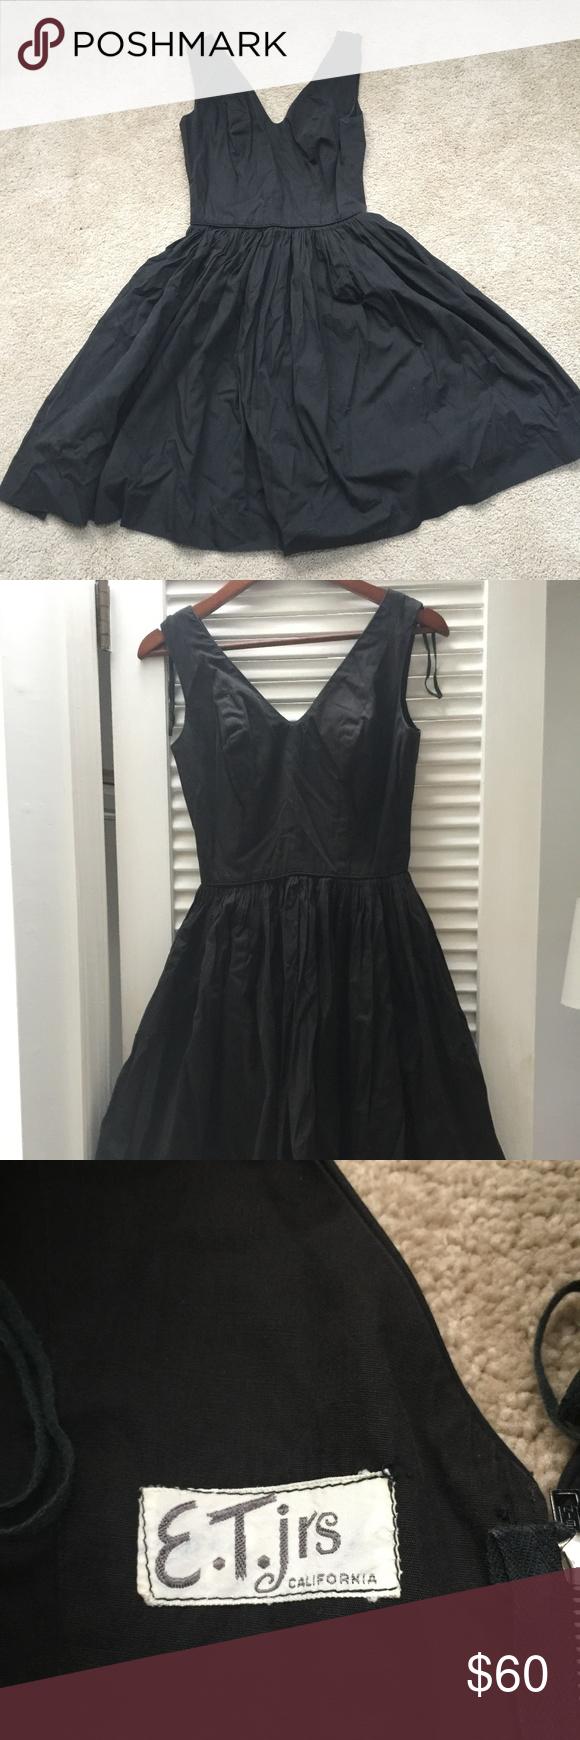 Vintage Little Black Dress E T Jrs Vintage Dress From The 1950 S Bought At A Vintage Store A Few Years Ago Little Black Dress Black Dress Vintage Black Dress [ 1740 x 580 Pixel ]